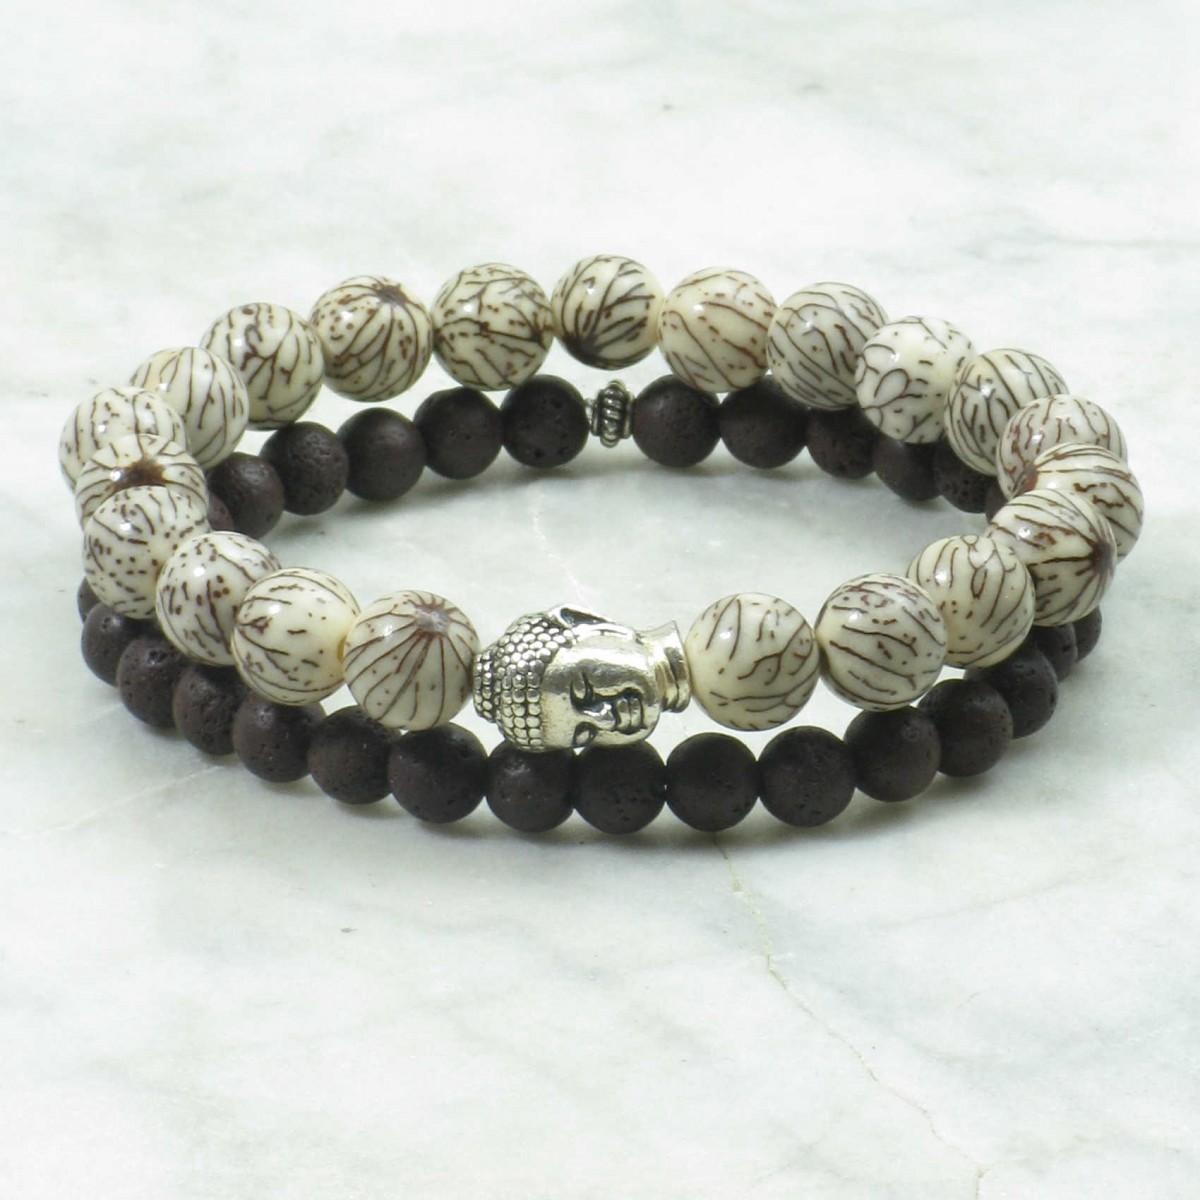 Bodhi_Bracelets_for_Men_Mala_Beads_Stacks_Bodhi_Seed_Agarwood_Buddhist_Prayer_Beads